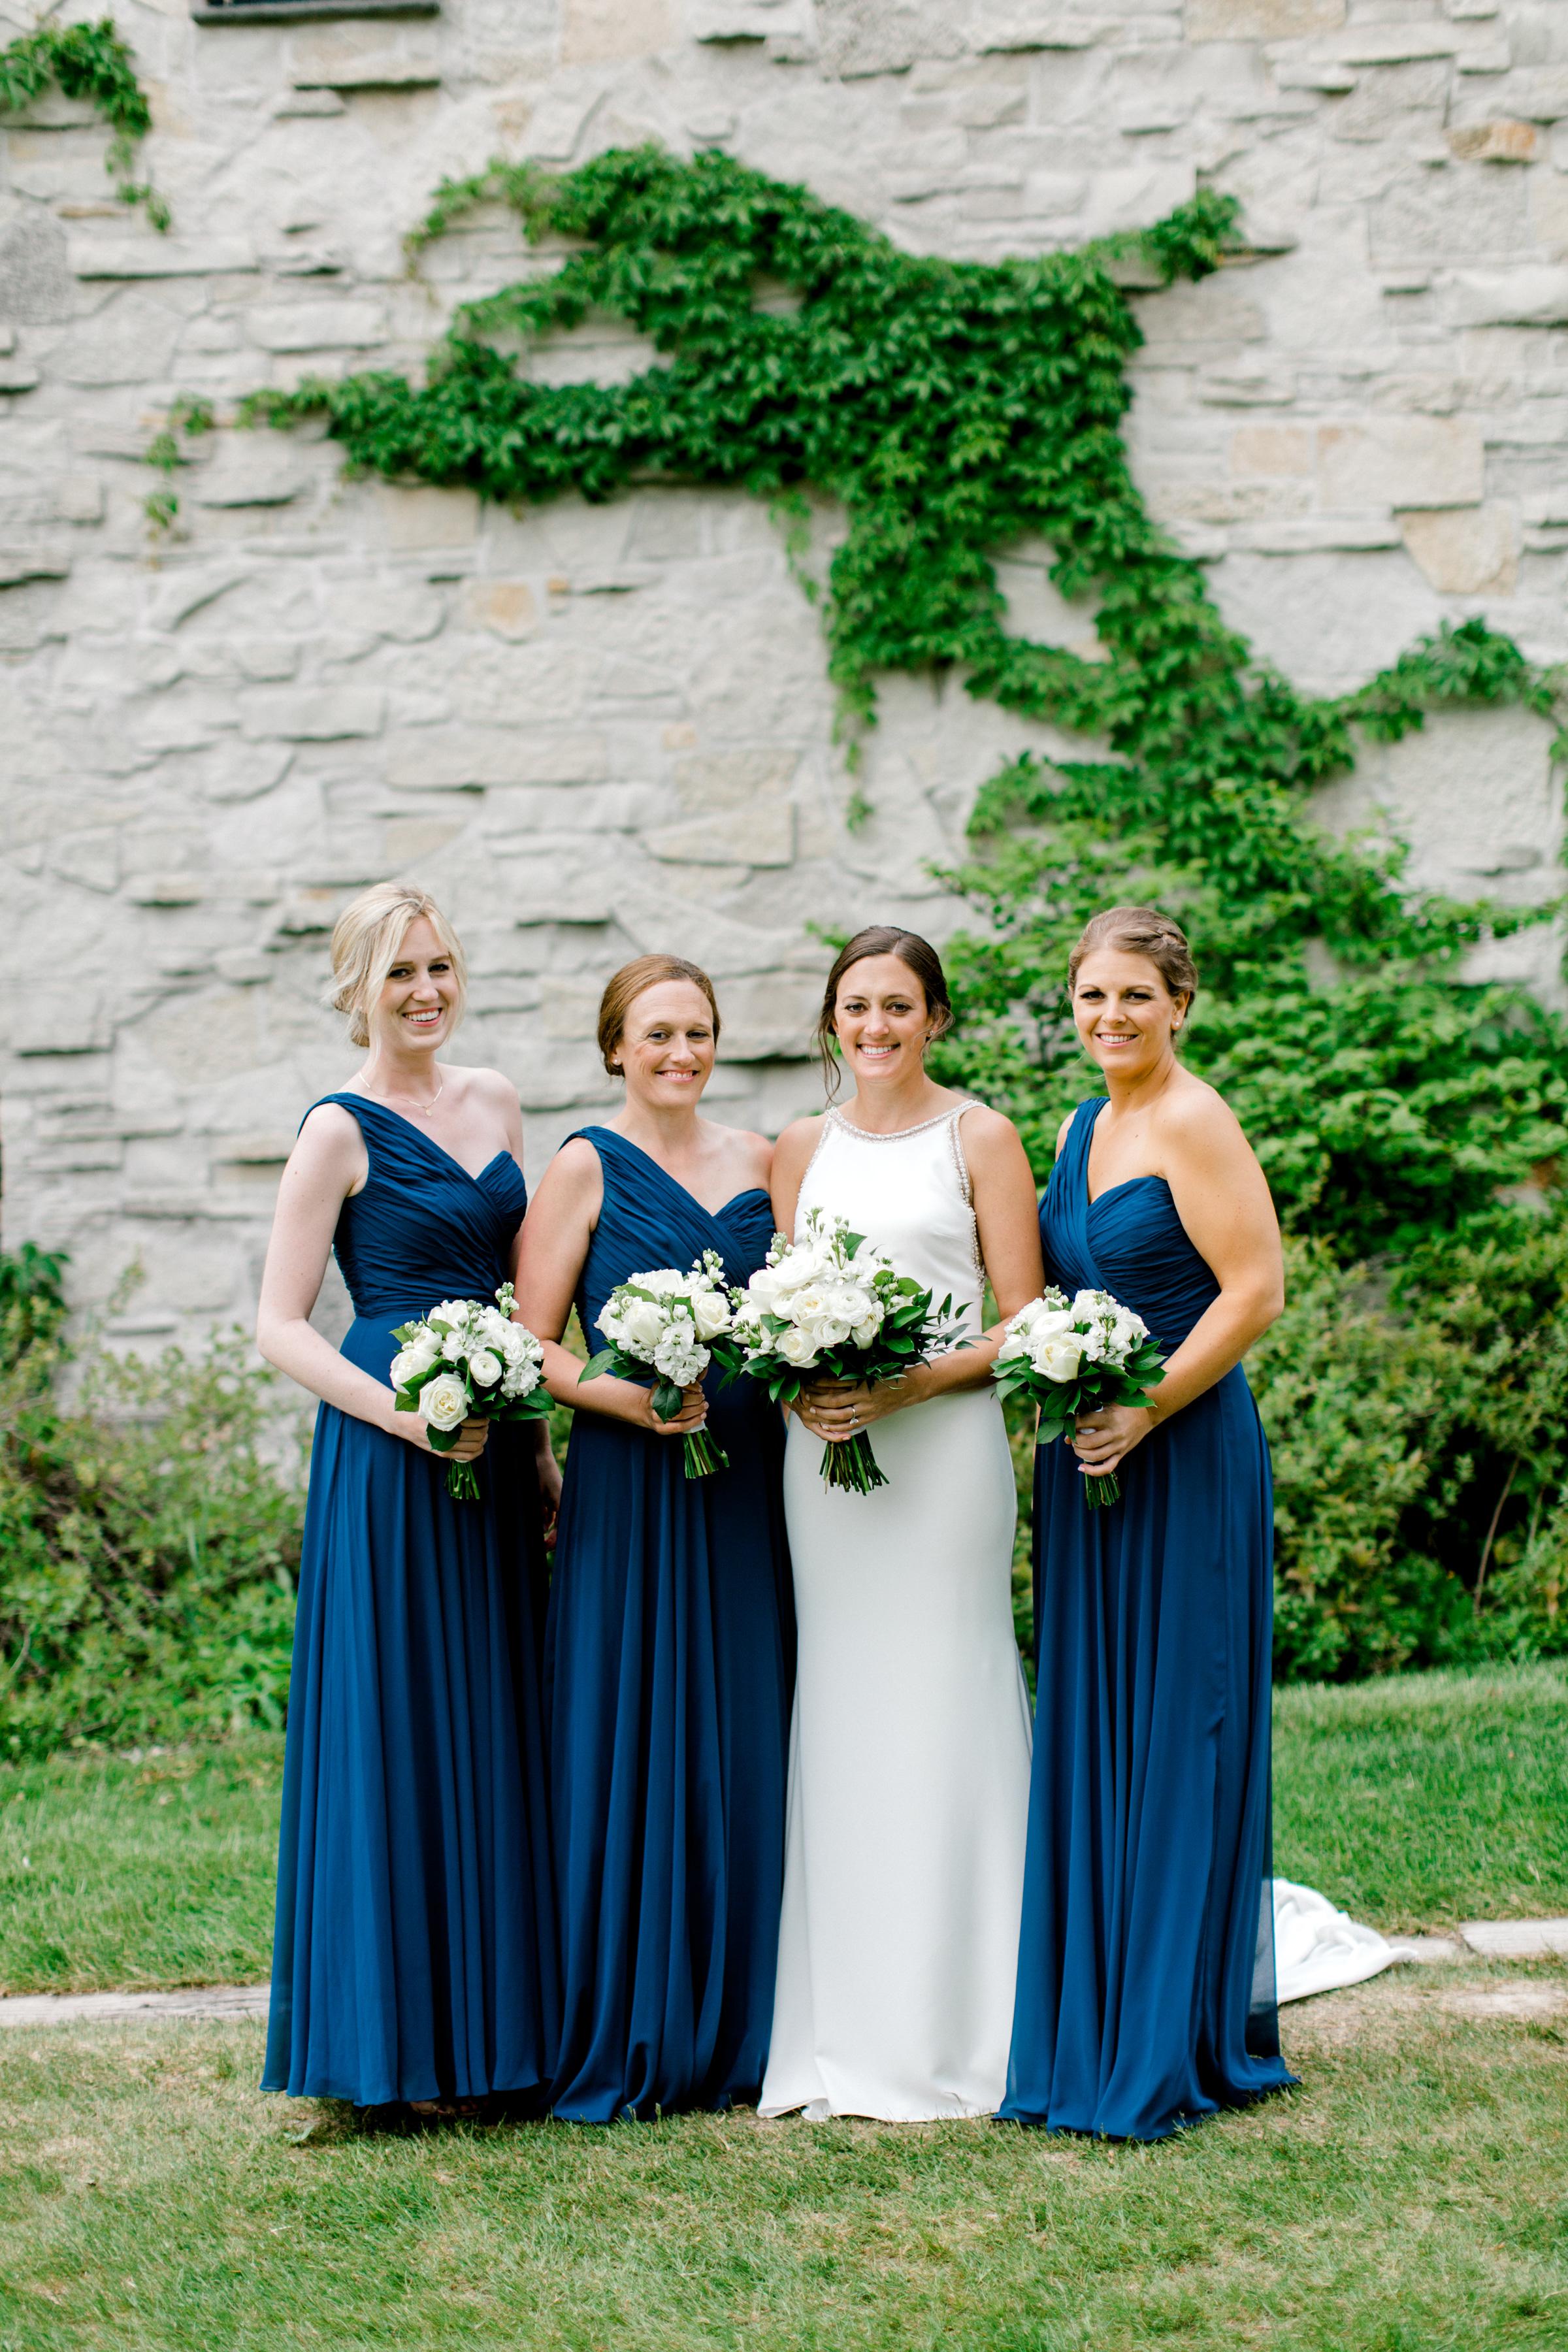 eeb0763381 Royal Blue Bridesmaids Dresses - Elizabeth Anne Designs  The Wedding ...